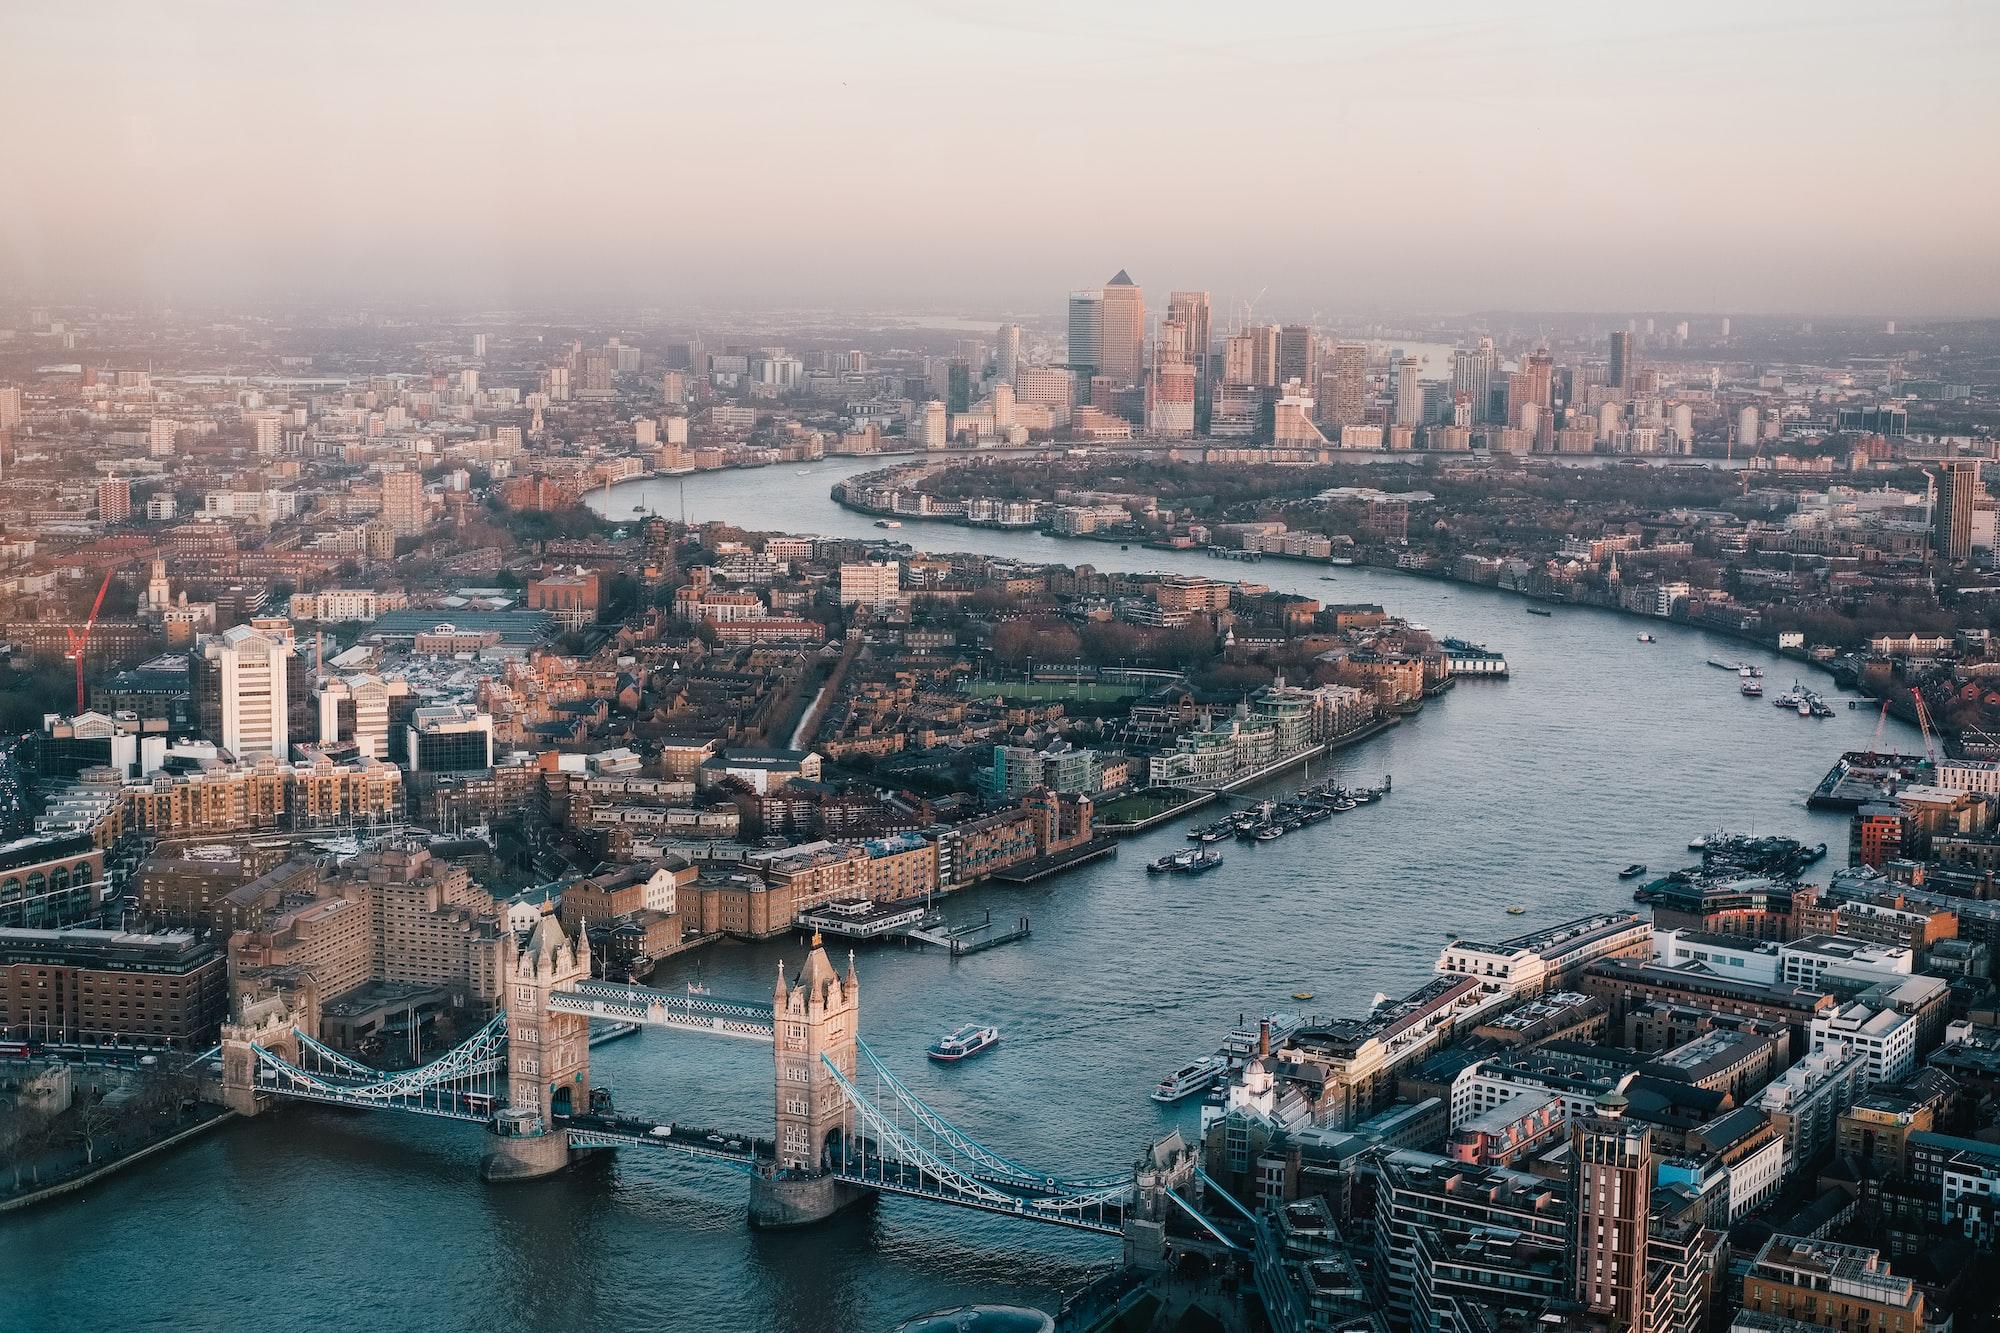 Winding through London